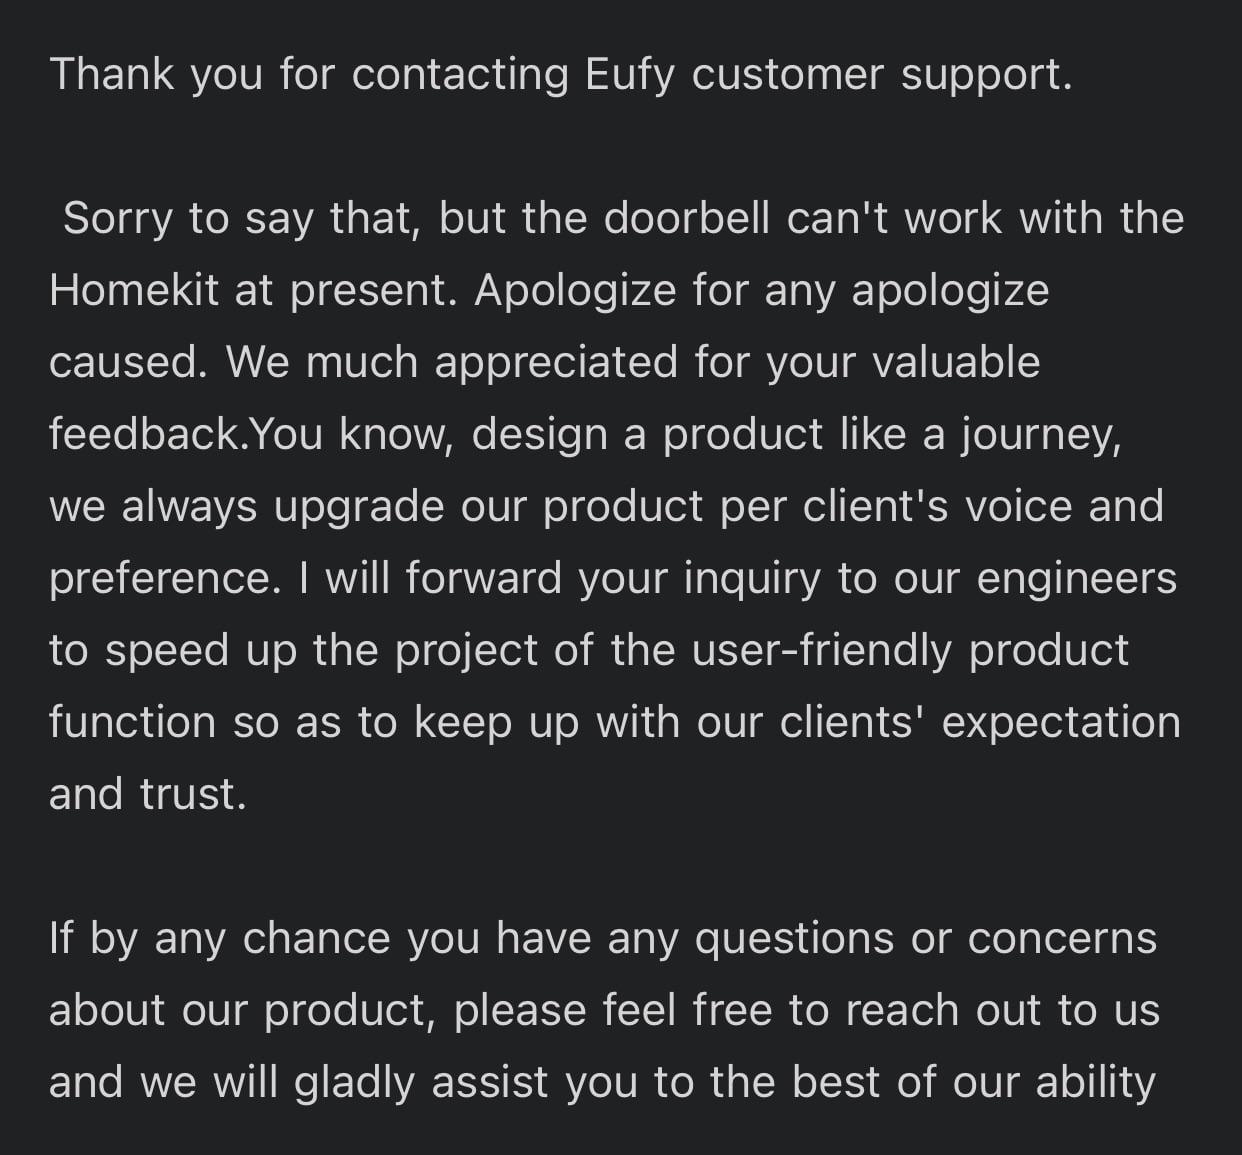 Eufy response about HomeKit doorbell